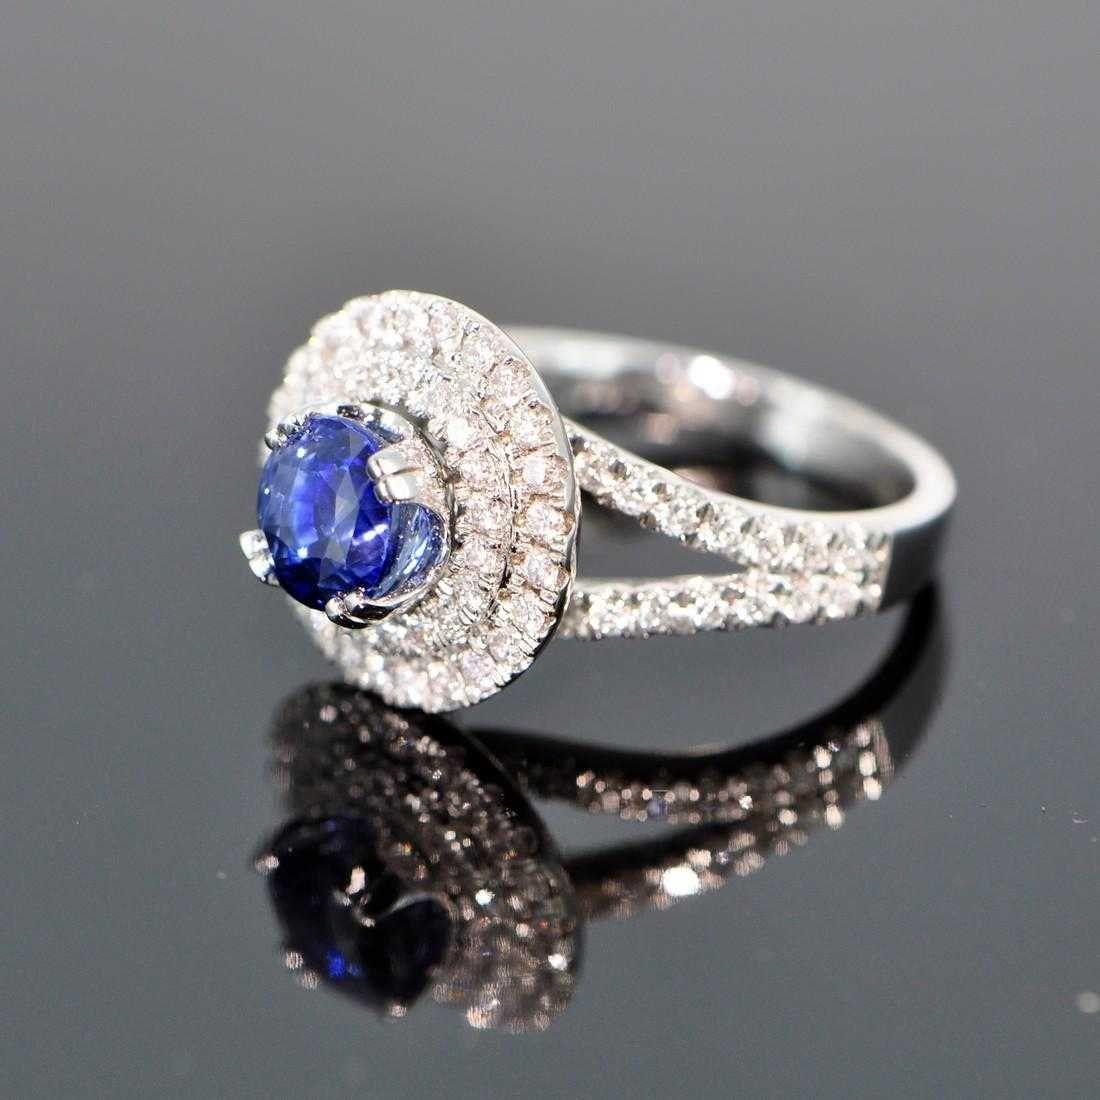 UNHEATED 216CT BRILLIANT CUT SAPPHIRE DIAMOND RING